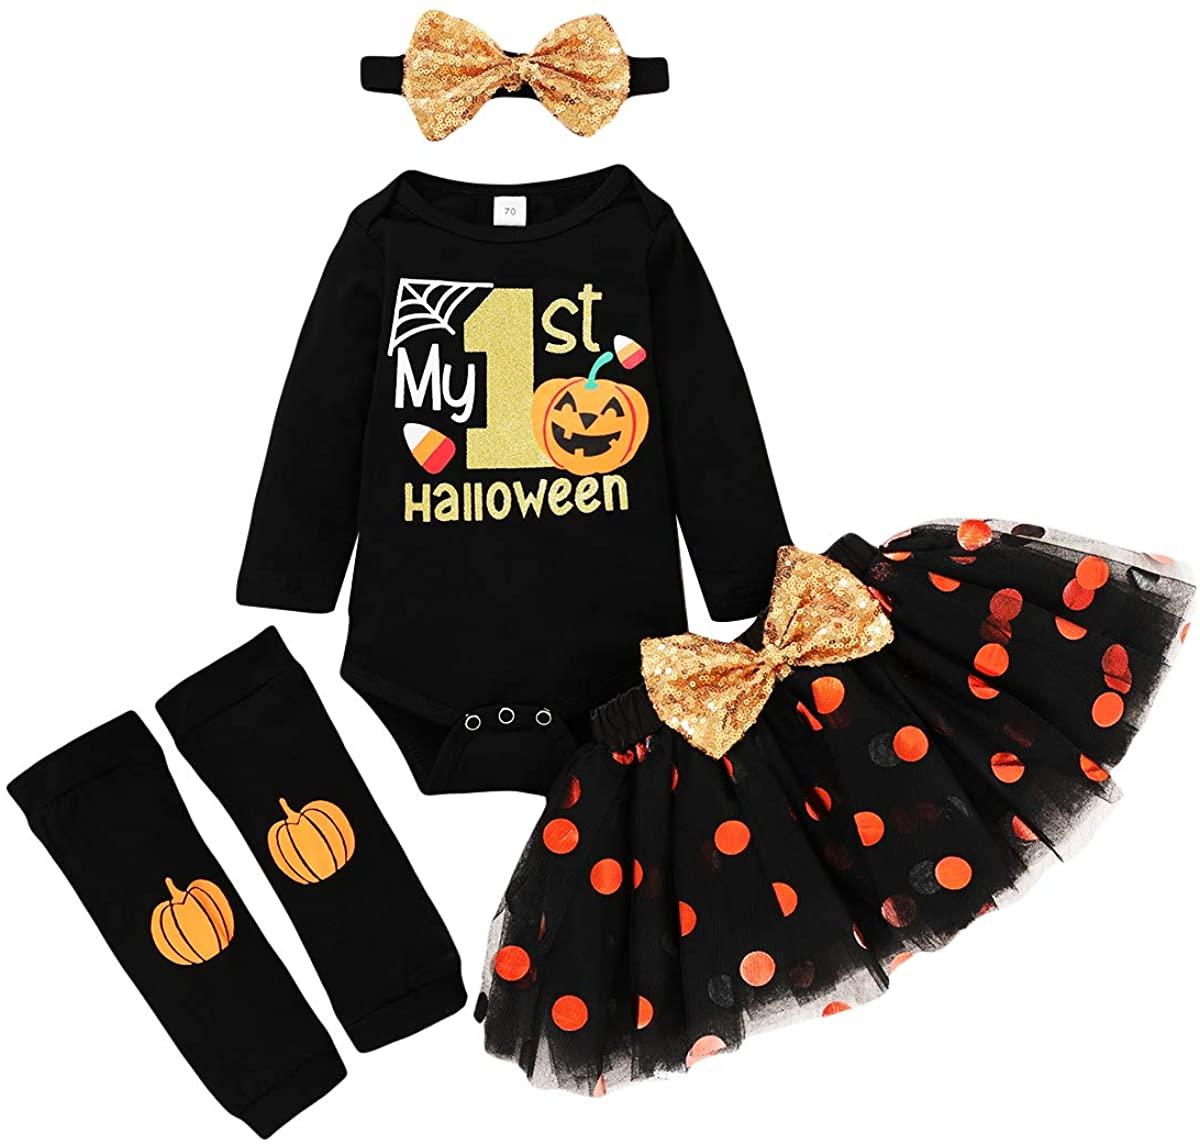 4pcs Halloween Baby Clothes My 1st Halloween Romper+Bowknot Polk Dot Tulle Dress+Pumpkin Leg Warmer+Headband Clothes Set